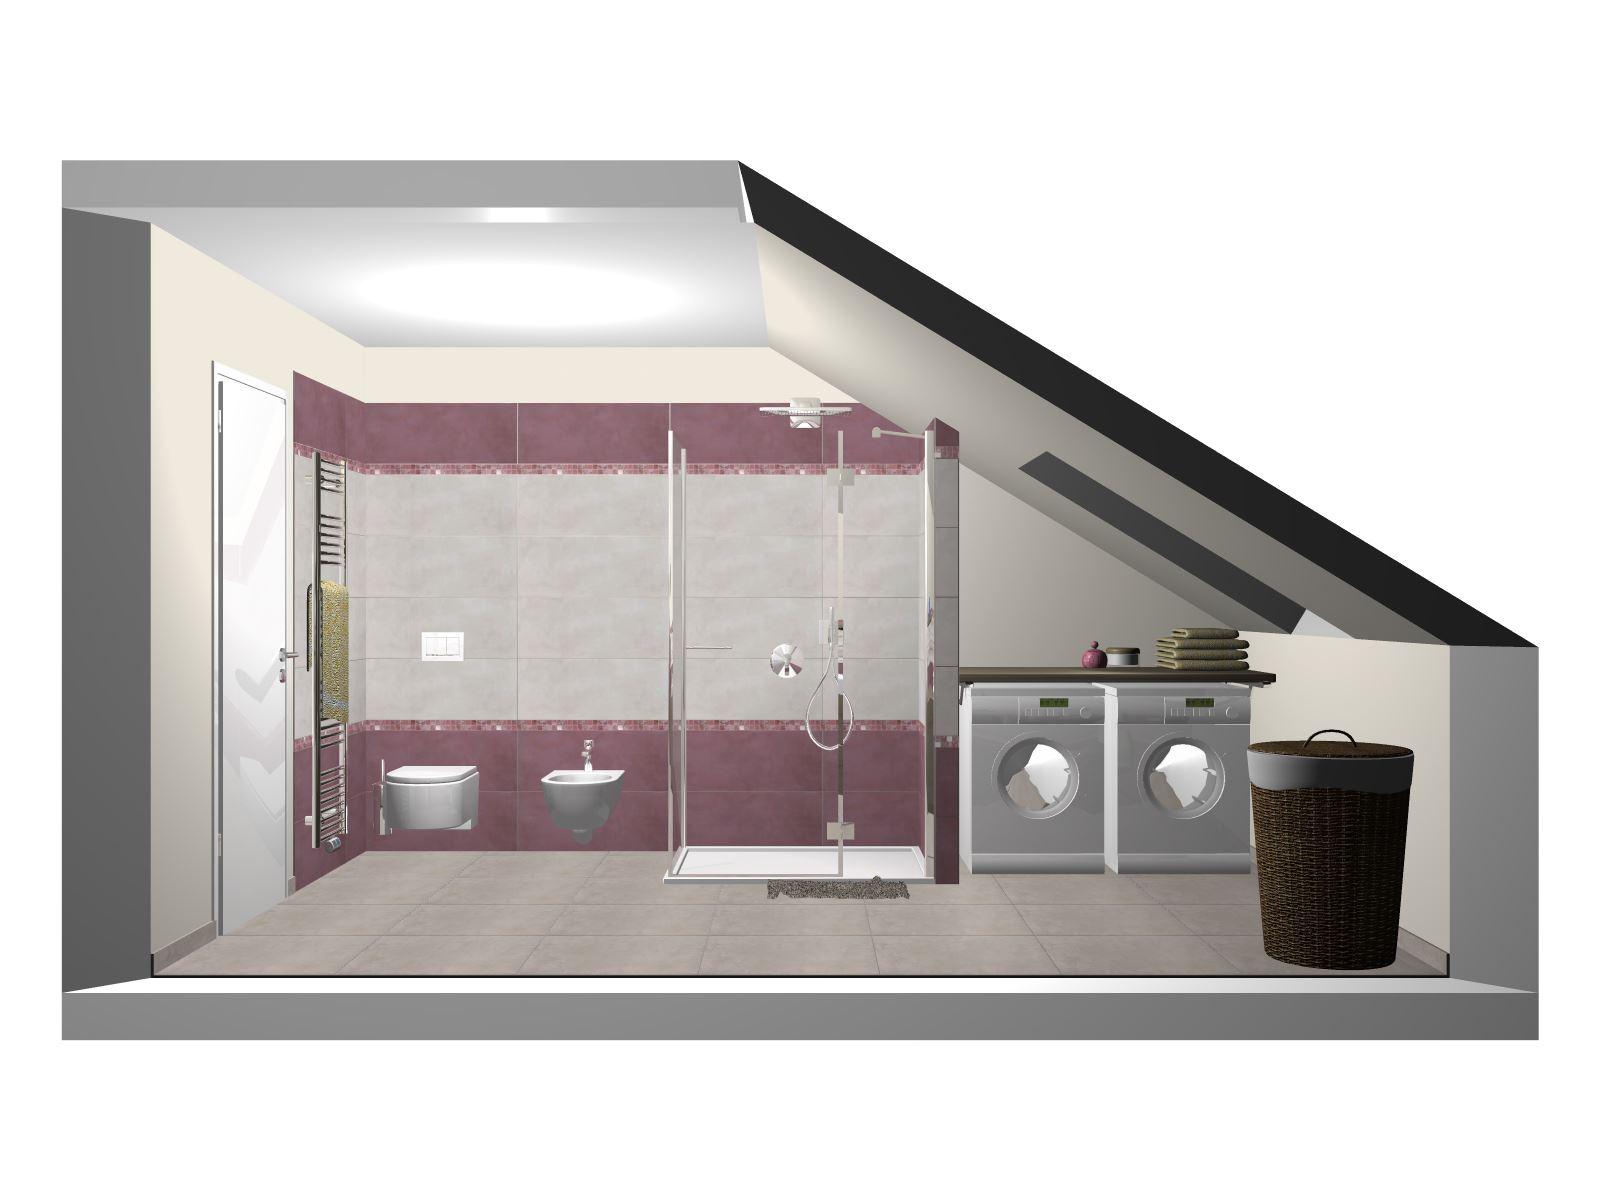 abk secret bathroom by pirman romana trgocev d o o on visoft360 portal. Black Bedroom Furniture Sets. Home Design Ideas